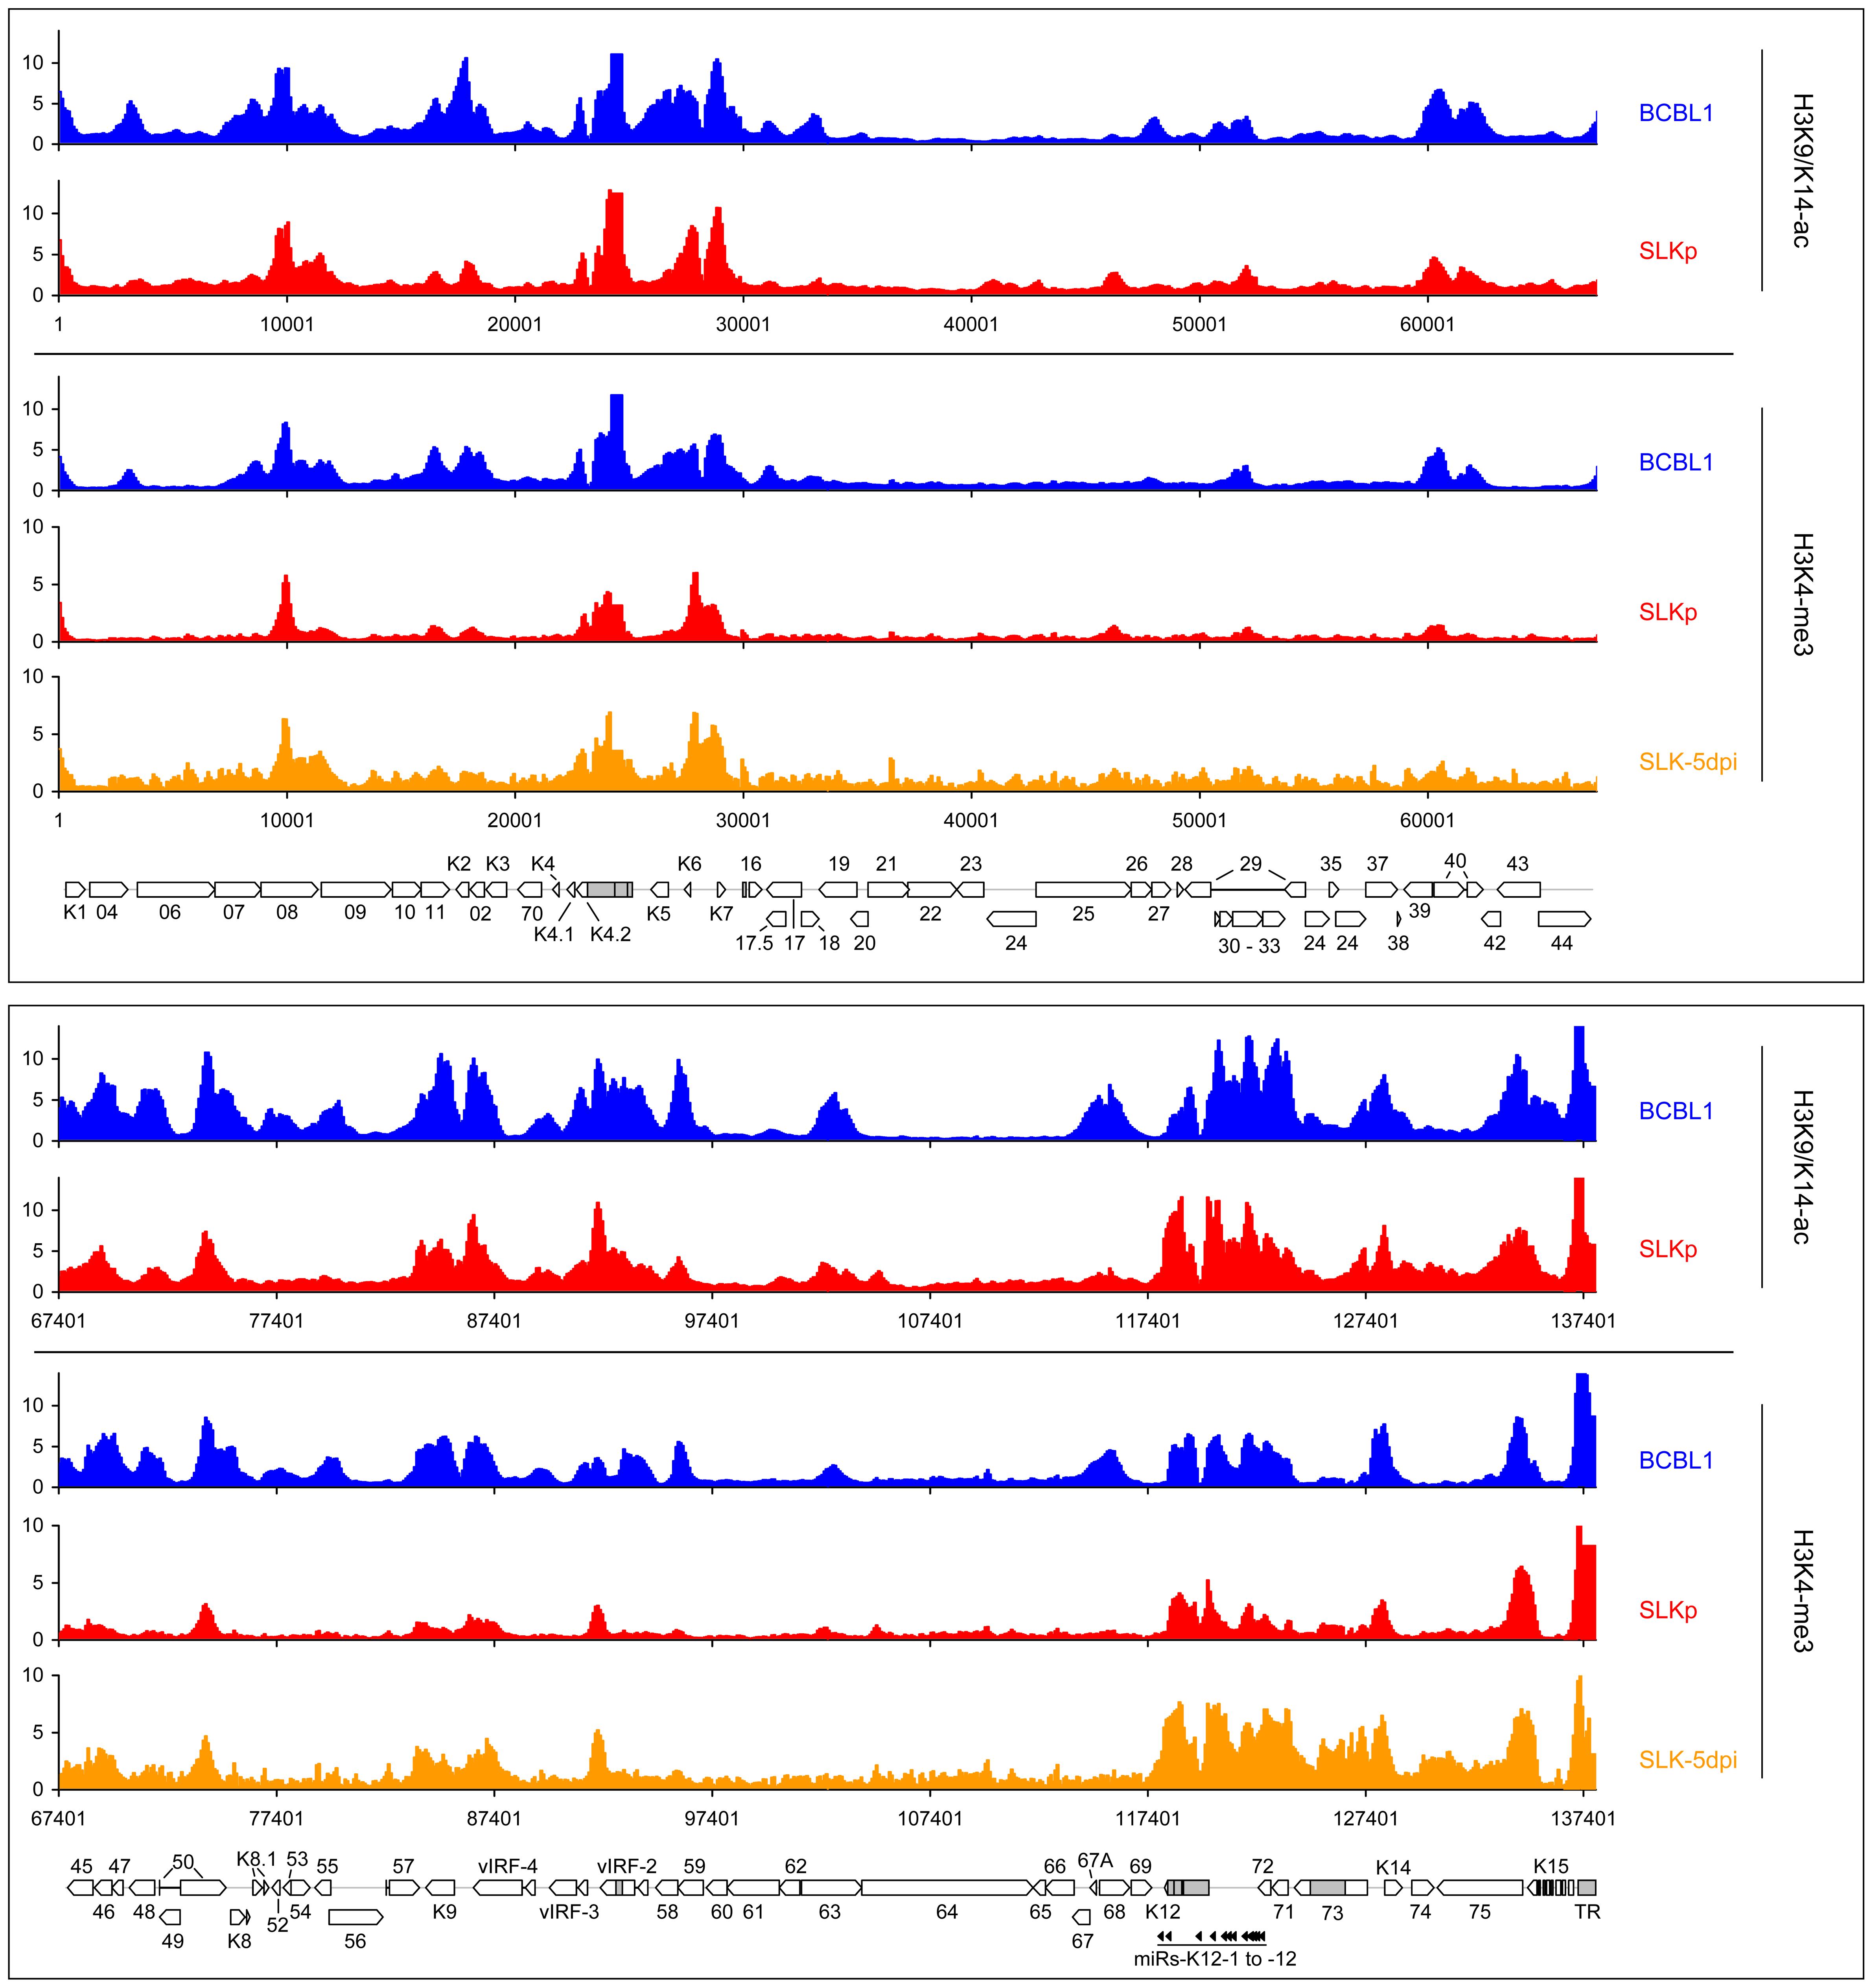 Global patterns of H3K9/K14 Acetylation and H3K4 tri-methylation on latent KSHV genomes.